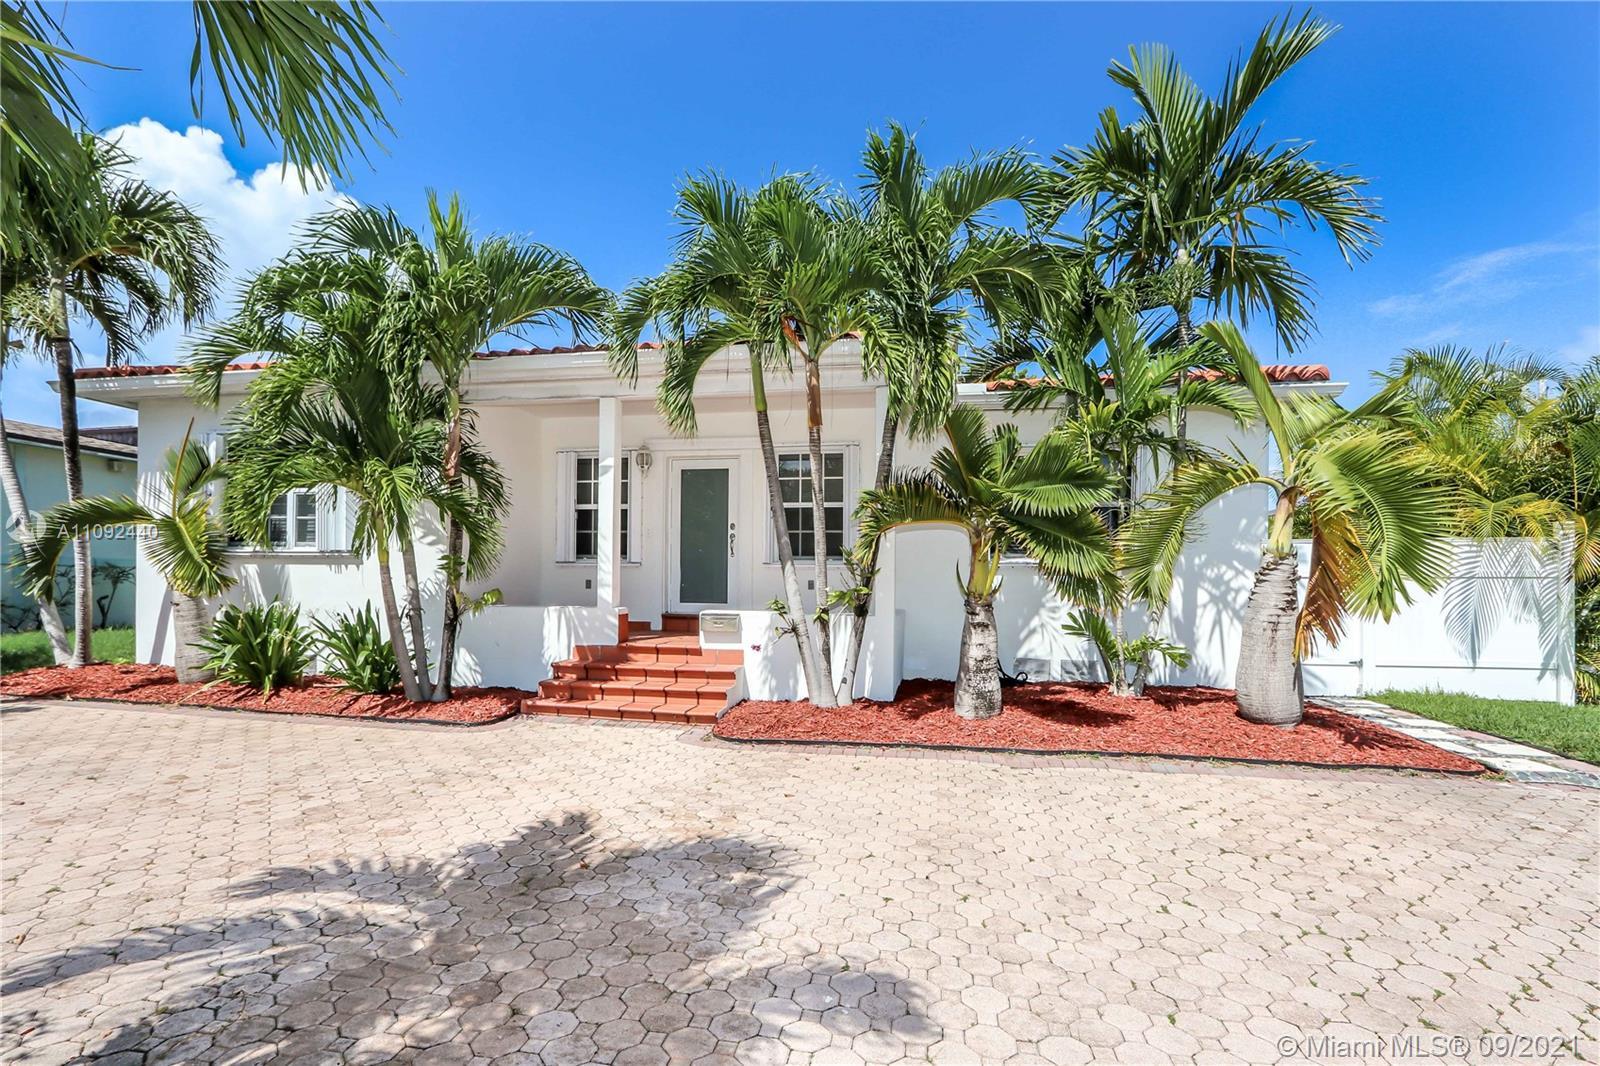 Biscayne Point - 8020 Noremac Ave, Miami Beach, FL 33141